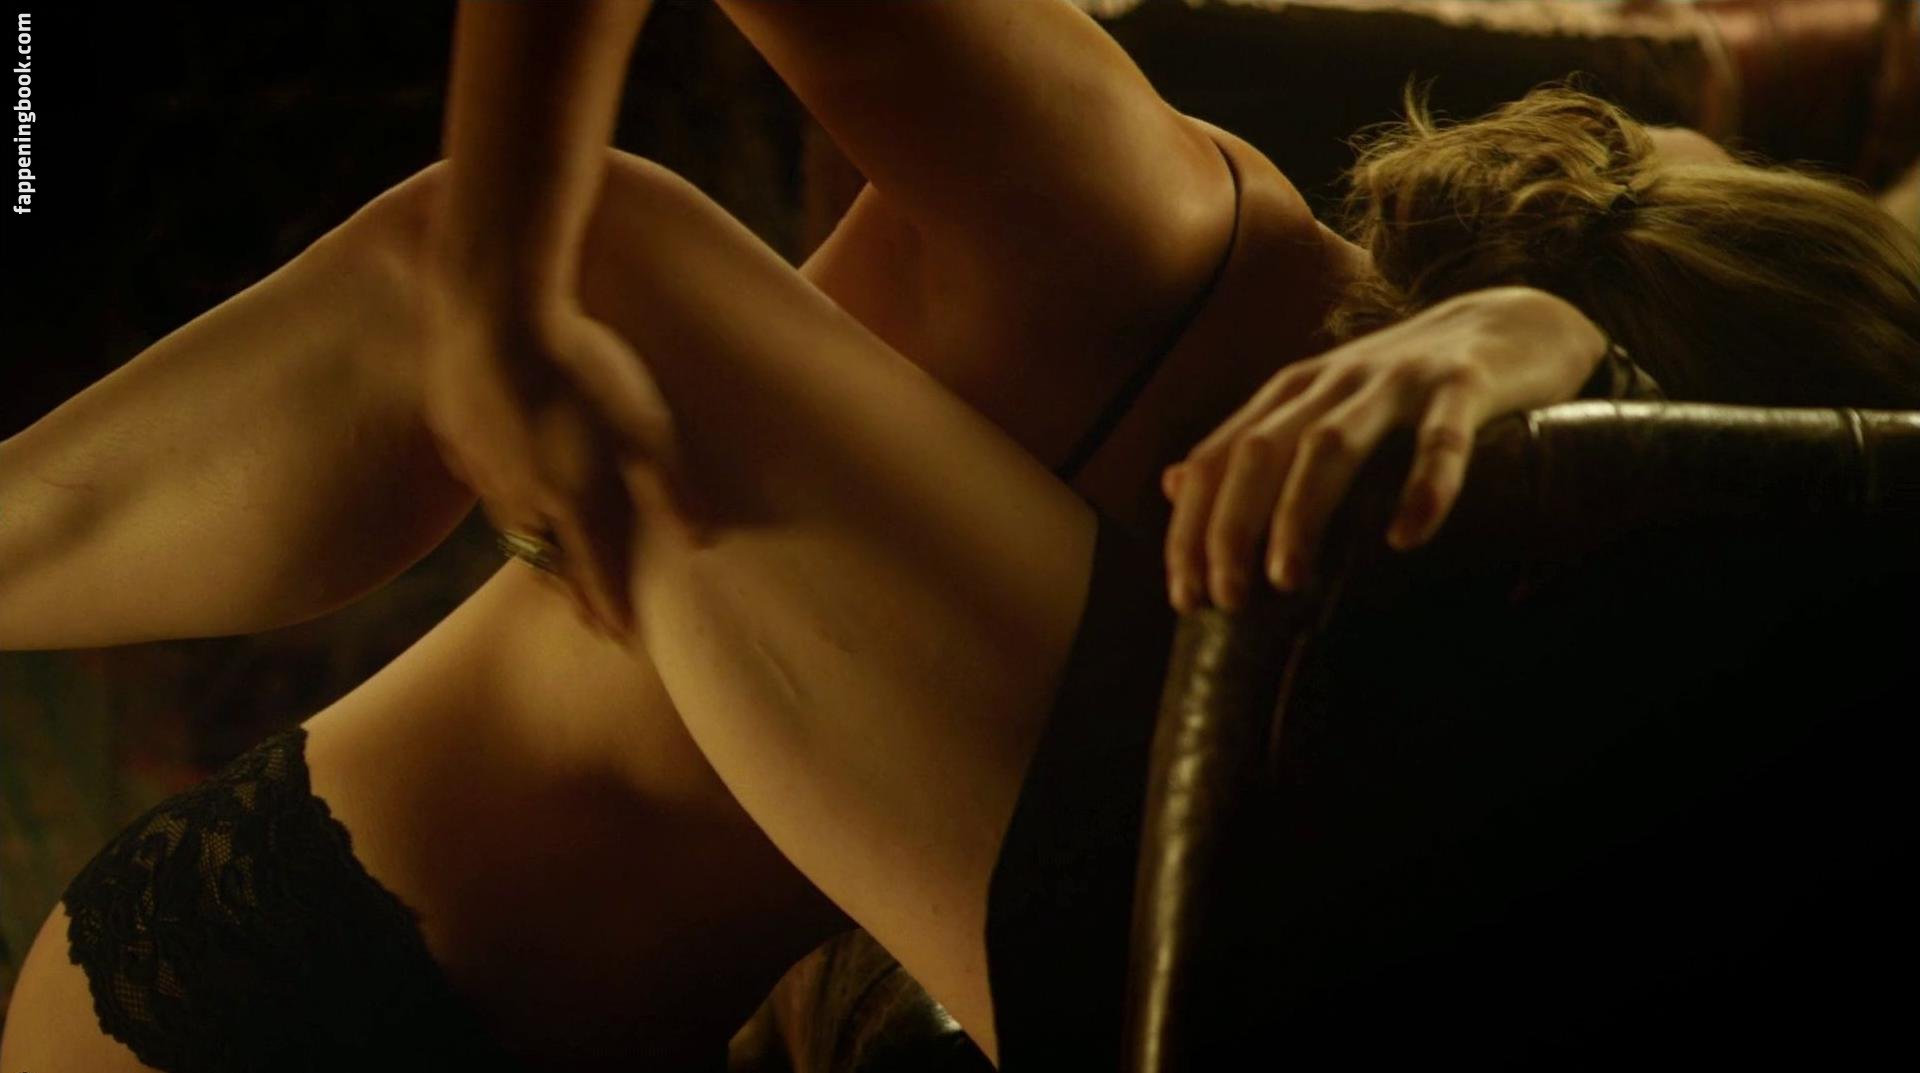 Zodwa wabantu nudes pussy ass